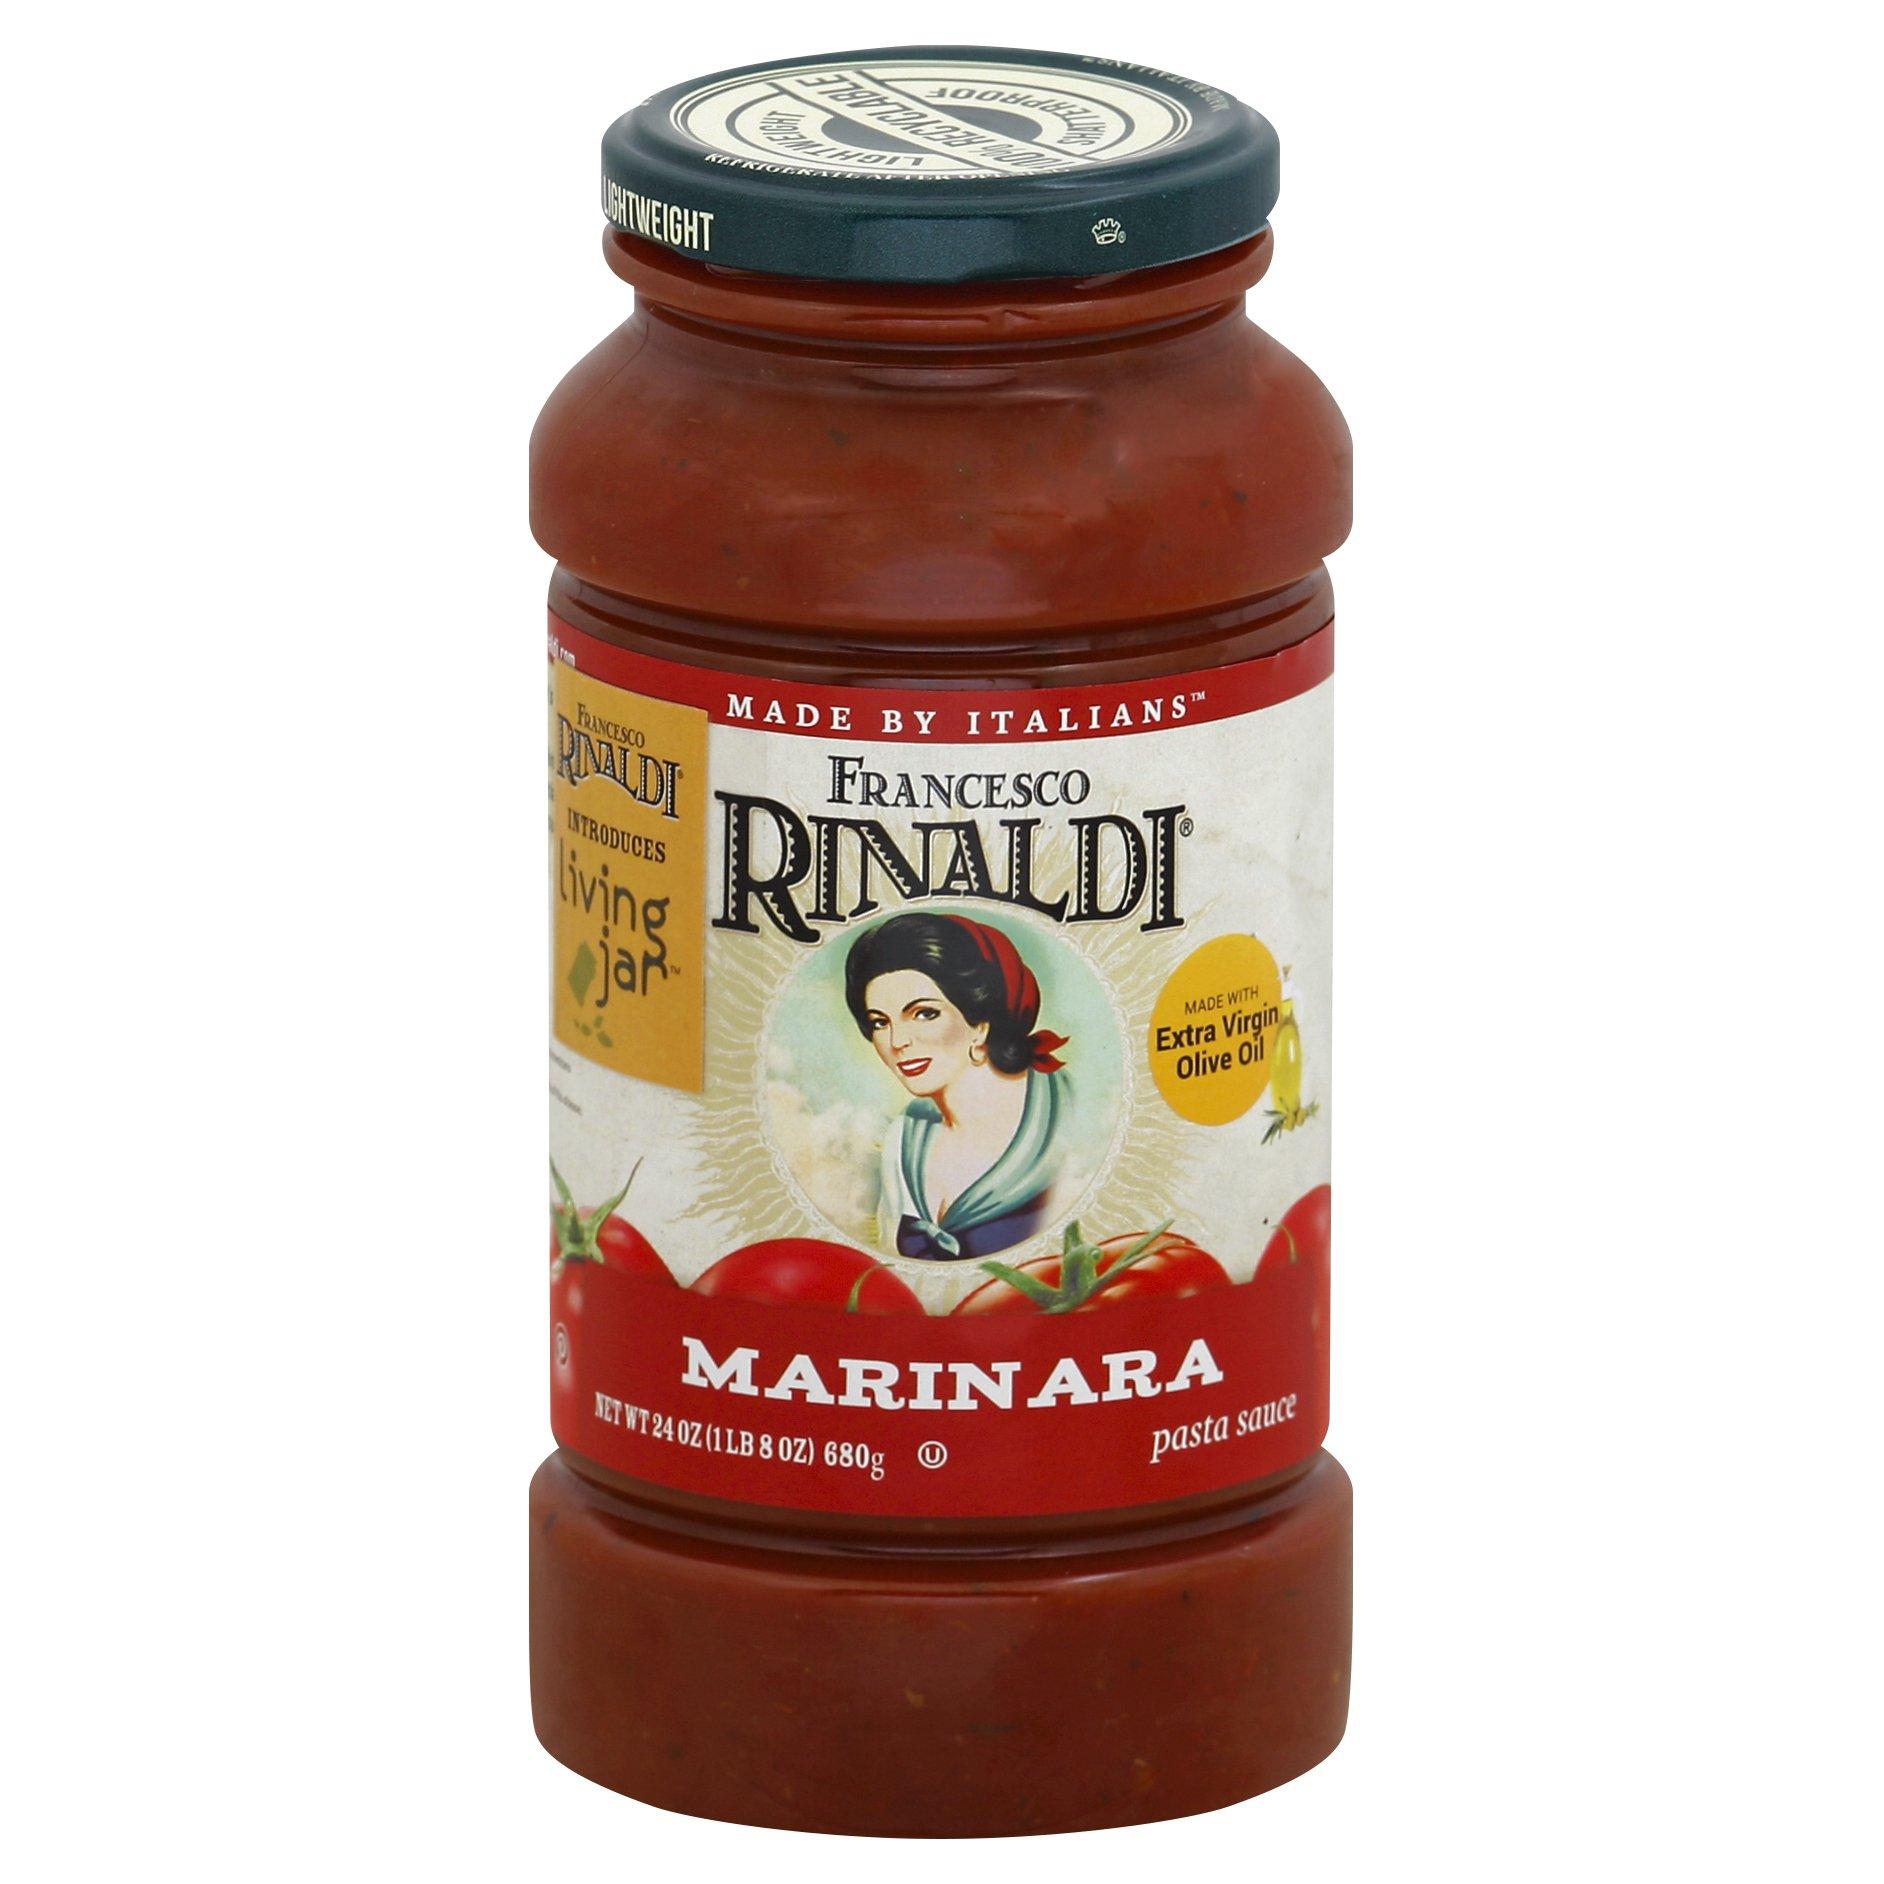 Francesco Rinal Marinara Pasta Sauce 24OZ 12-Pack